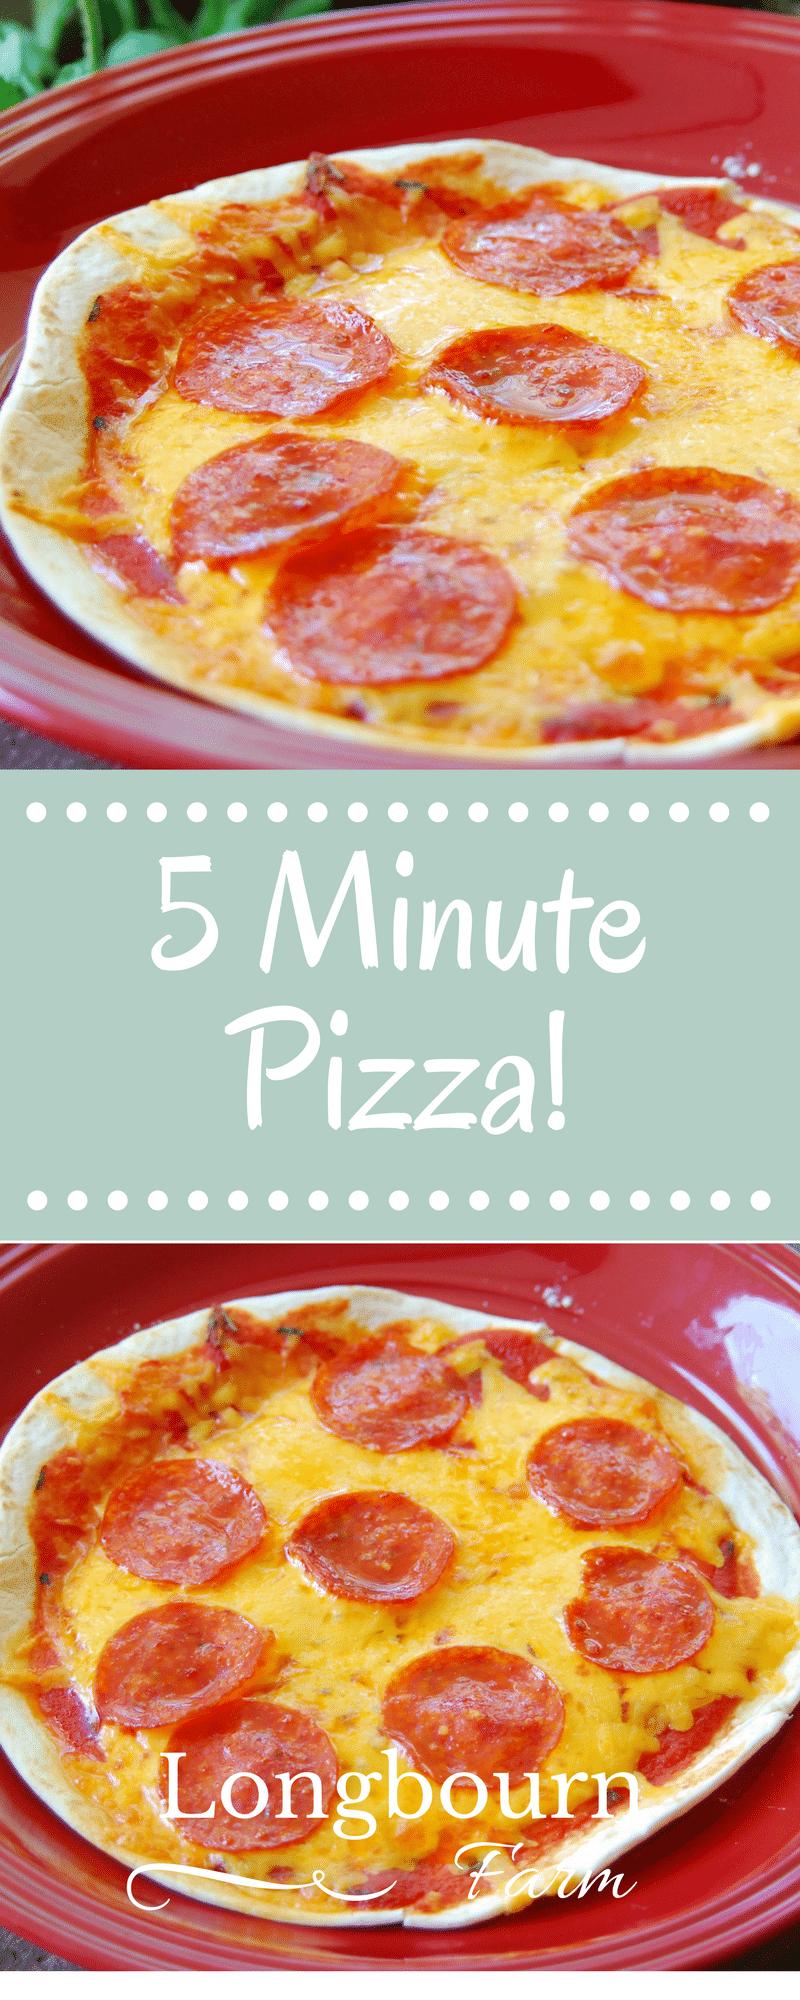 5 Minute Pizza • Longbourn Farm